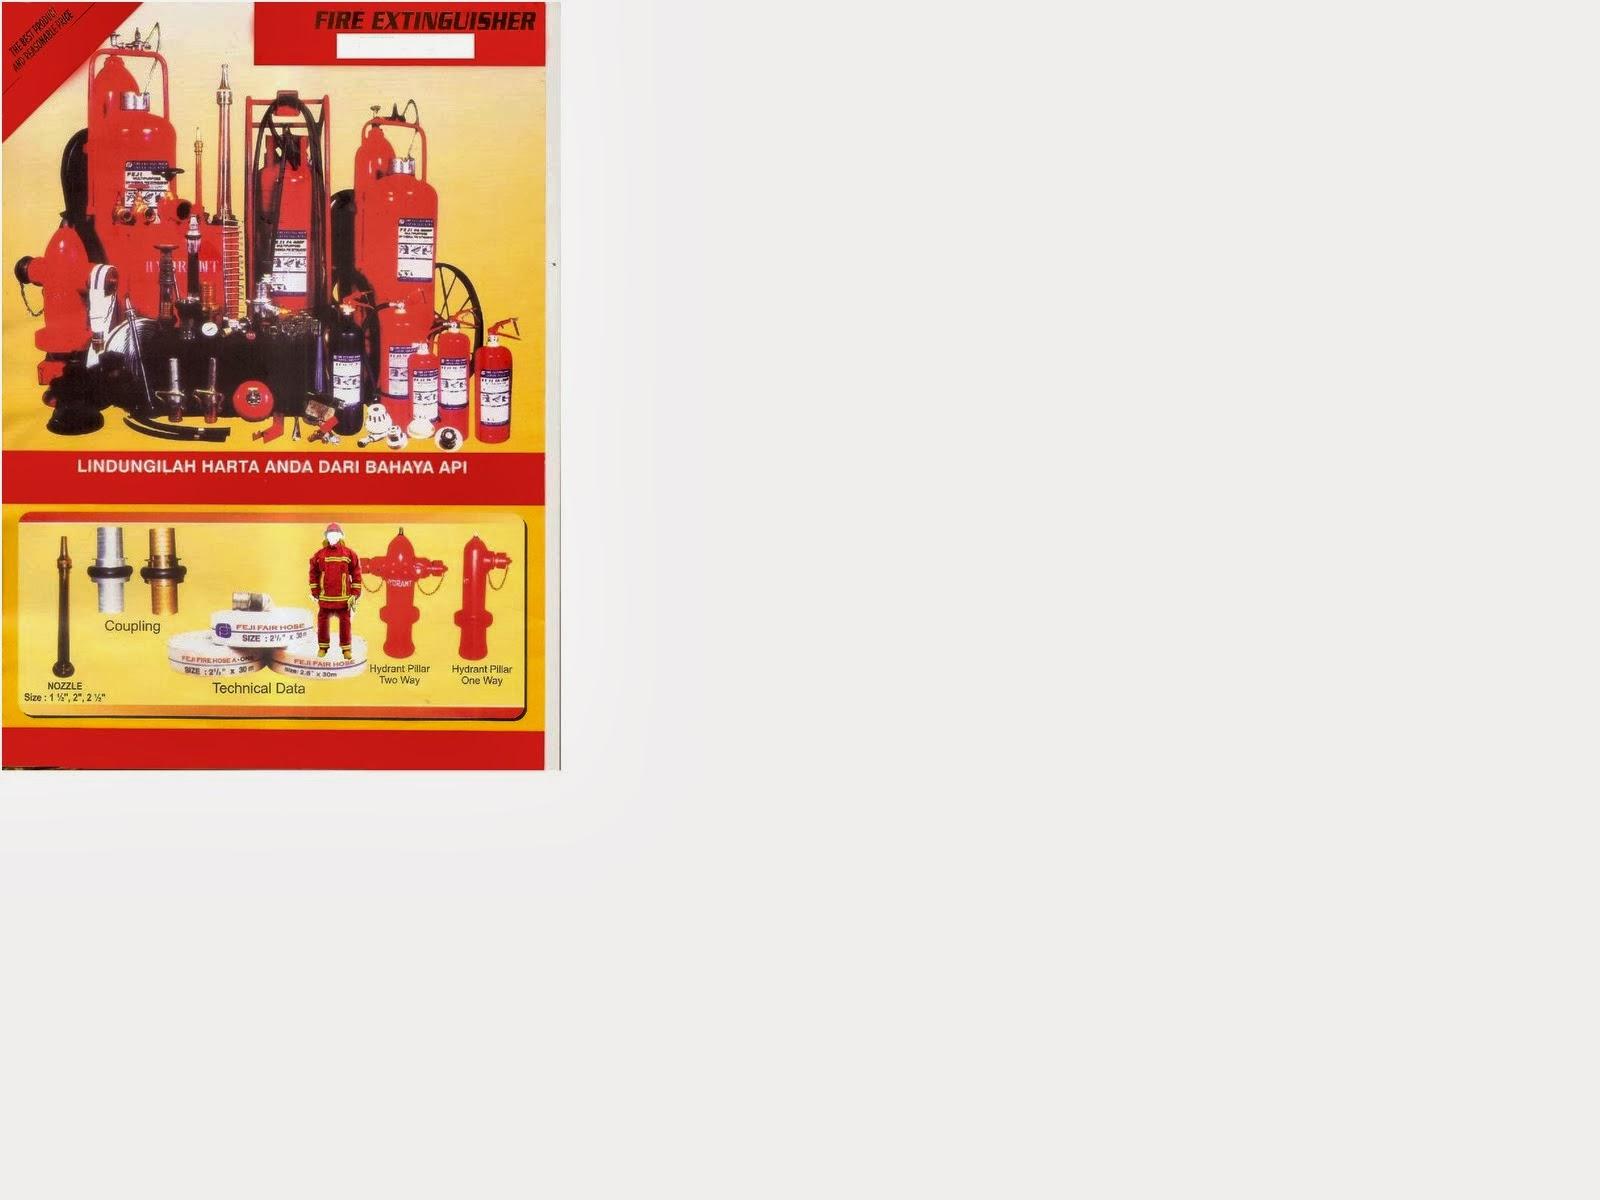 Dijual alat pemadam kebakaran ( Fire extinguishers )